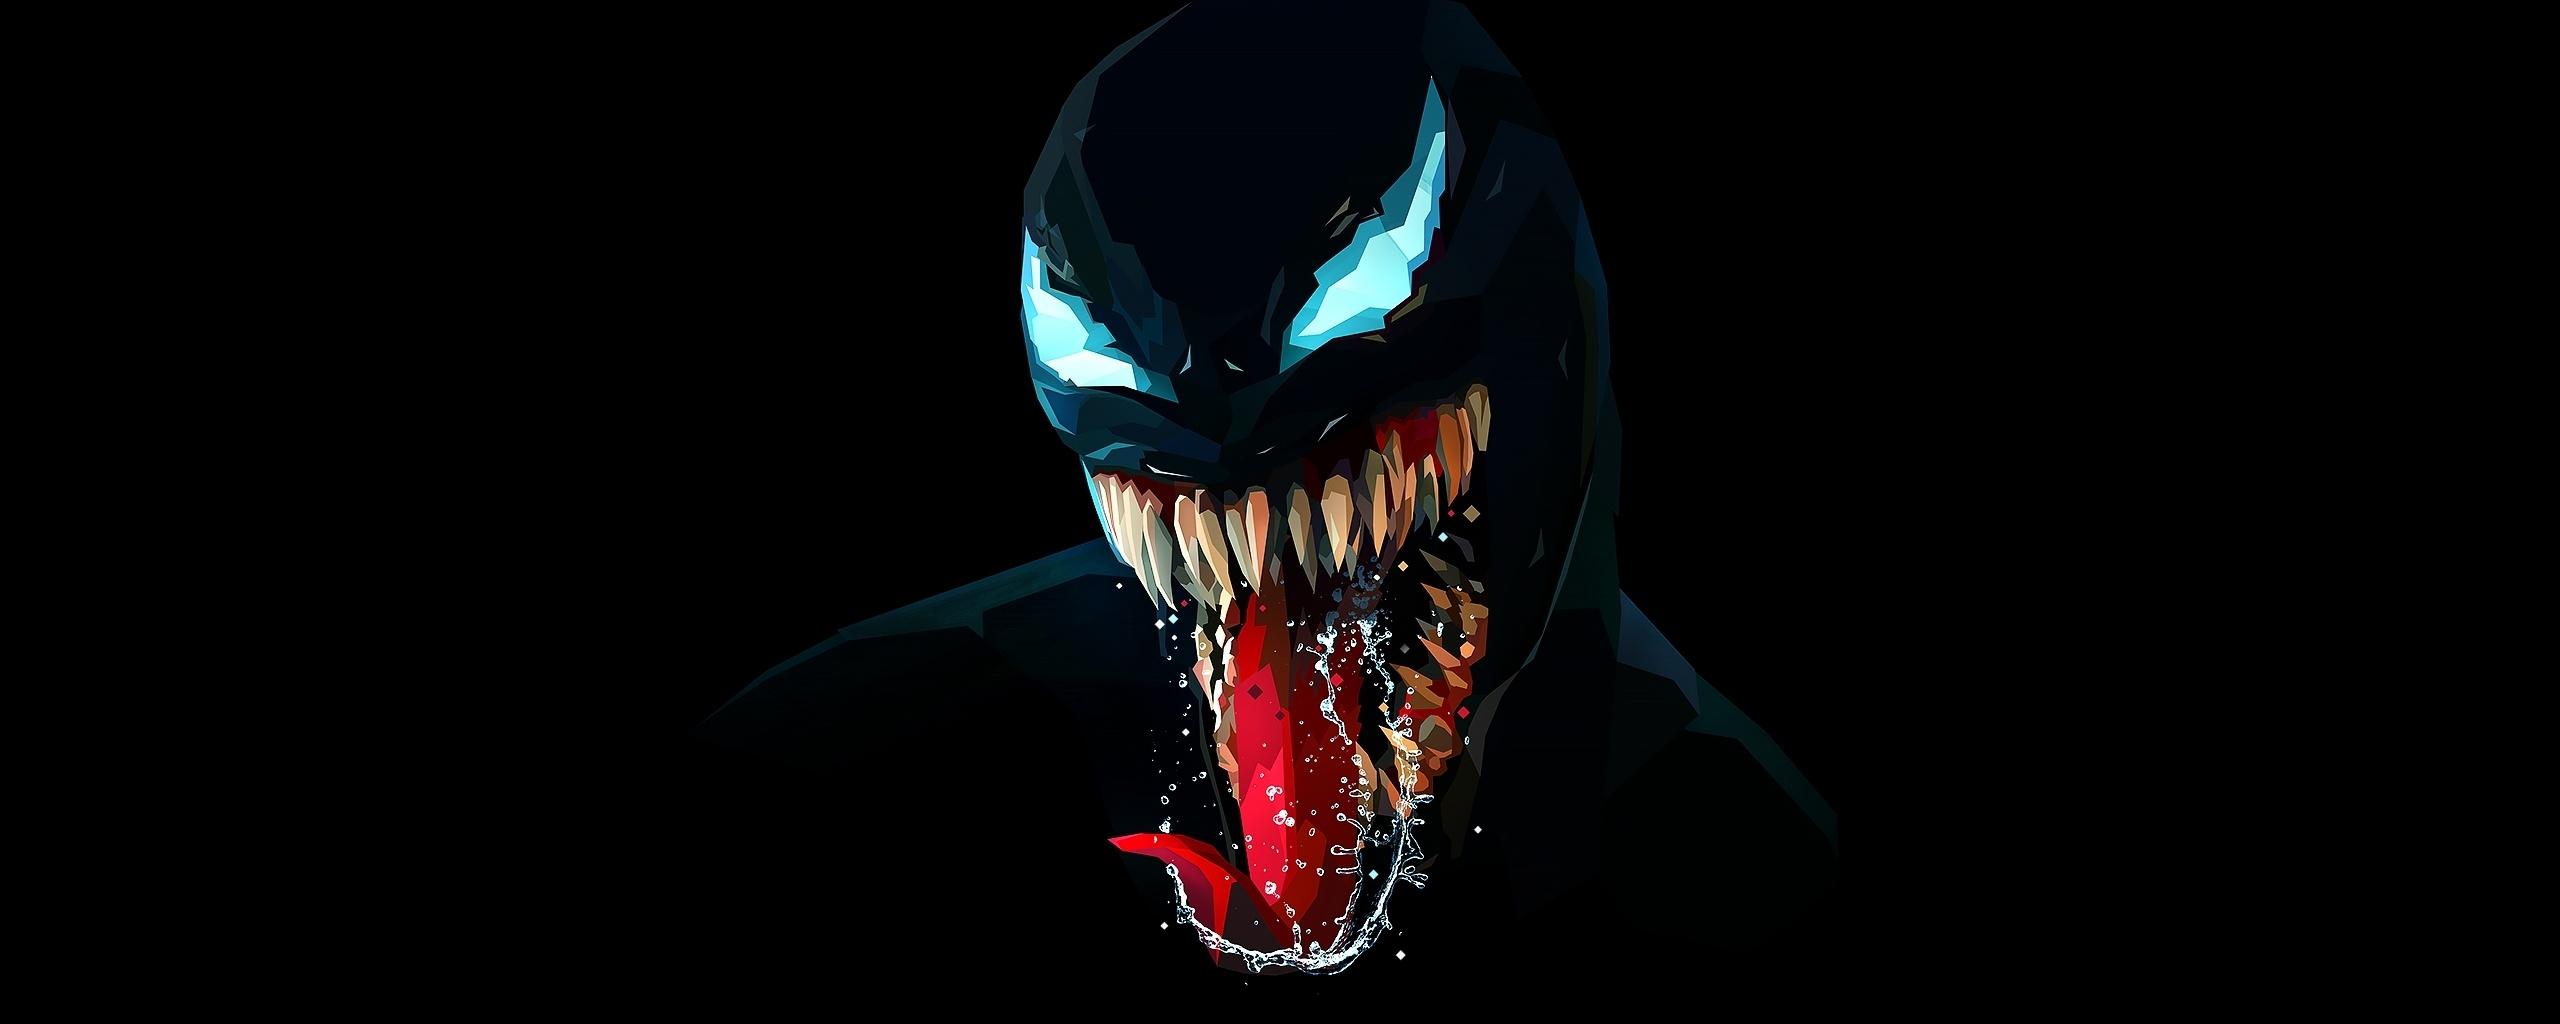 Download 2560x1024 Wallpaper Venom Artwork Minimal Dark